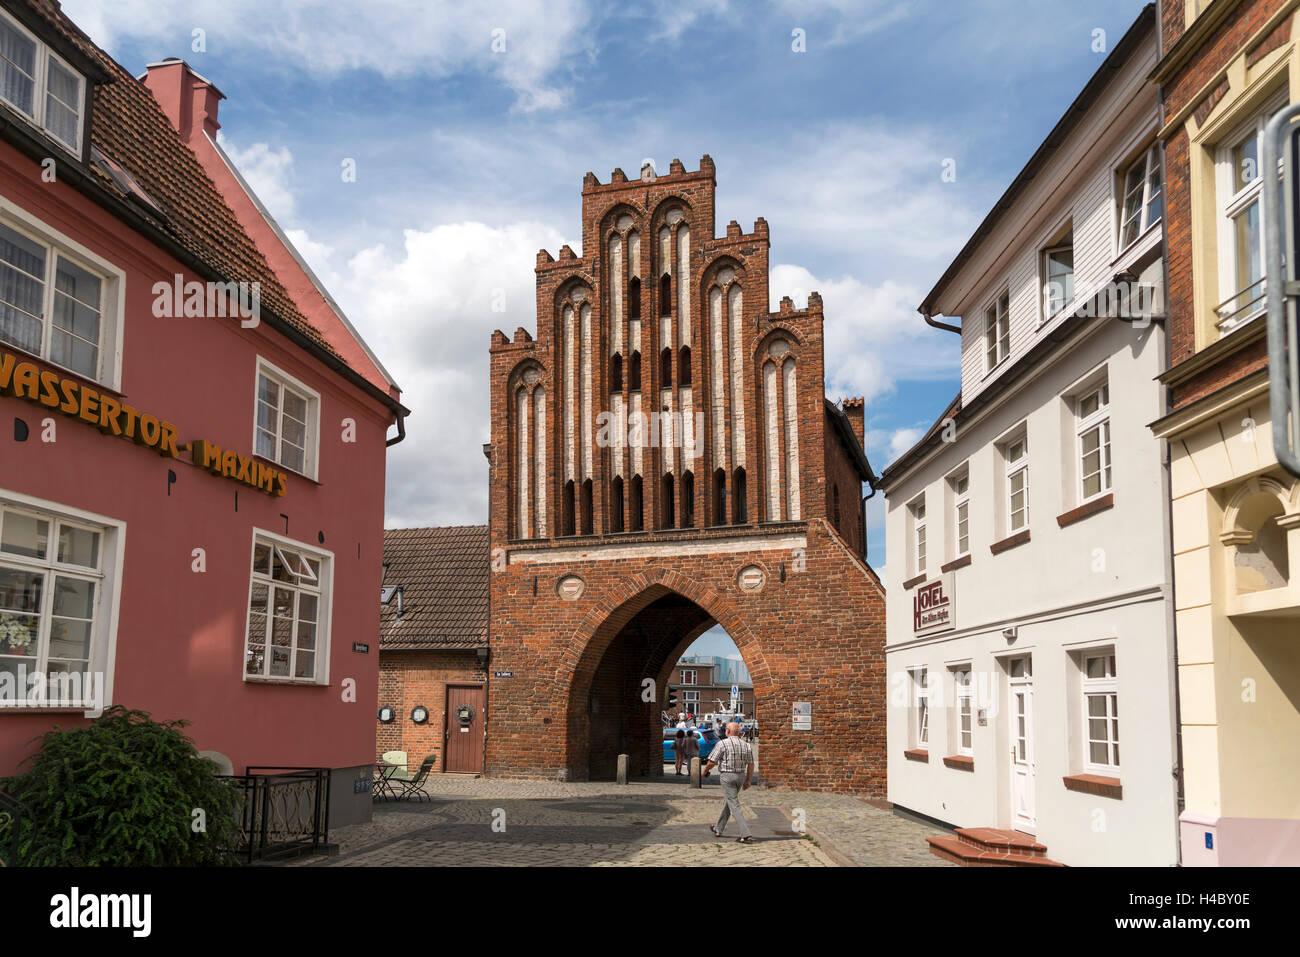 city gate  watergate, Hanseatic City of Wismar, Mecklenburg-Vorpommern, Germany - Stock Image